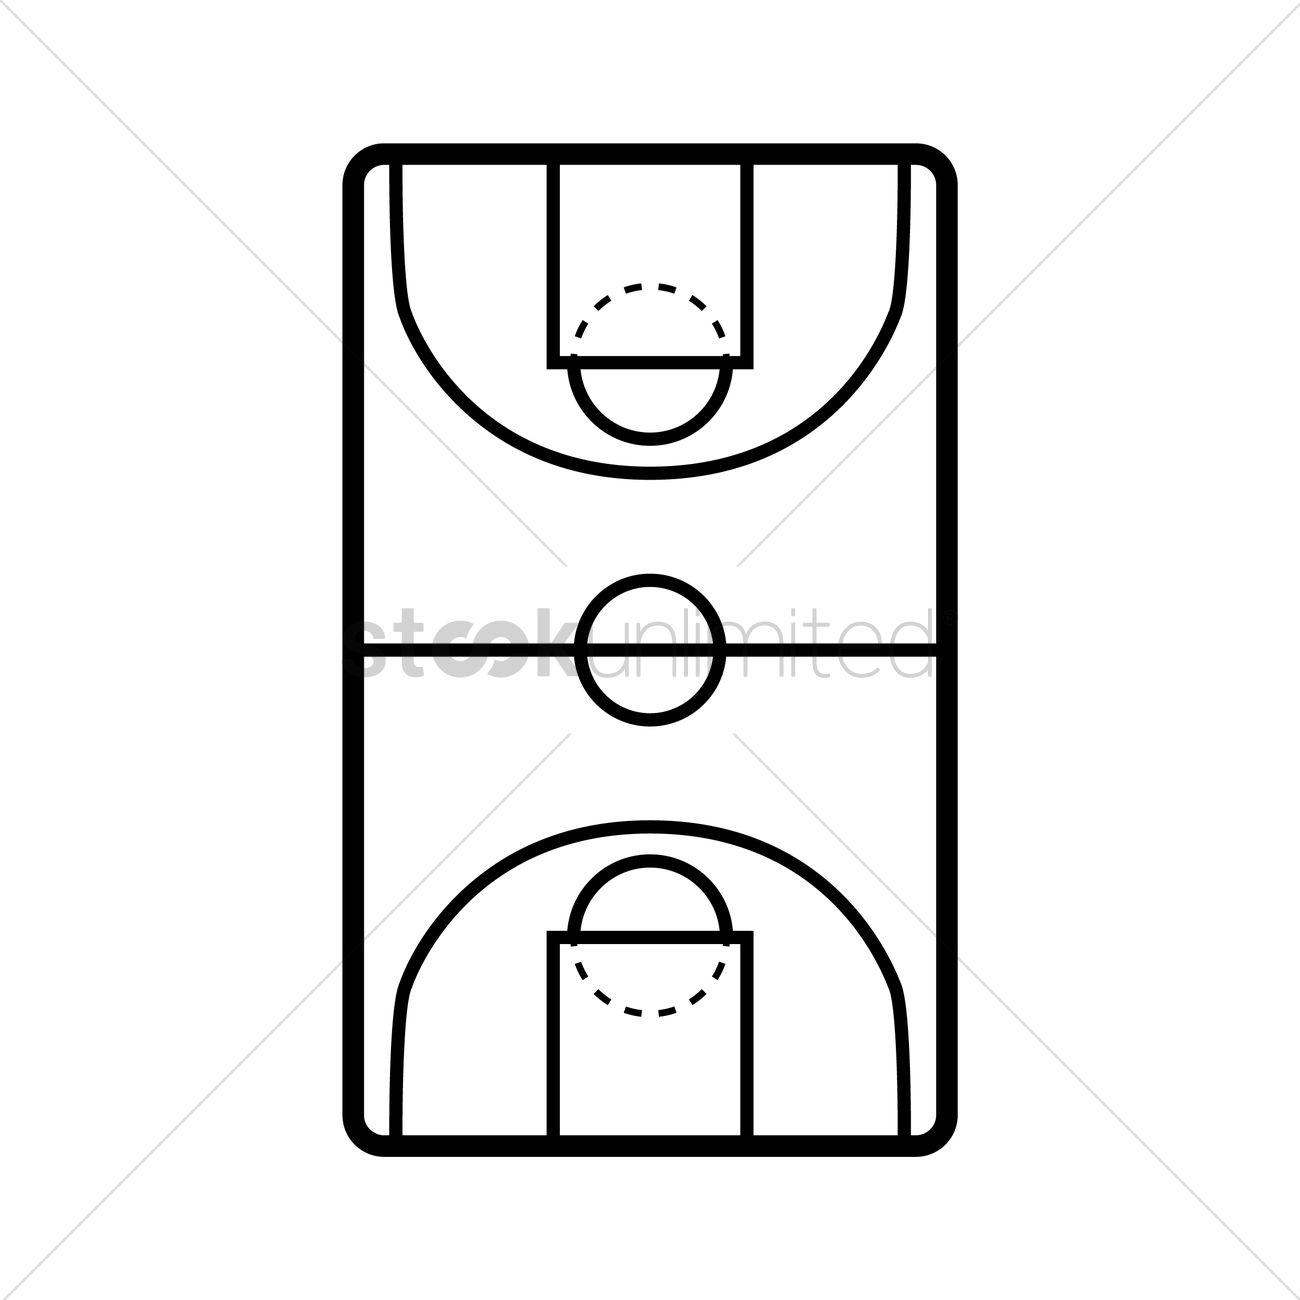 1300x1300 Basketball Court Vector Image